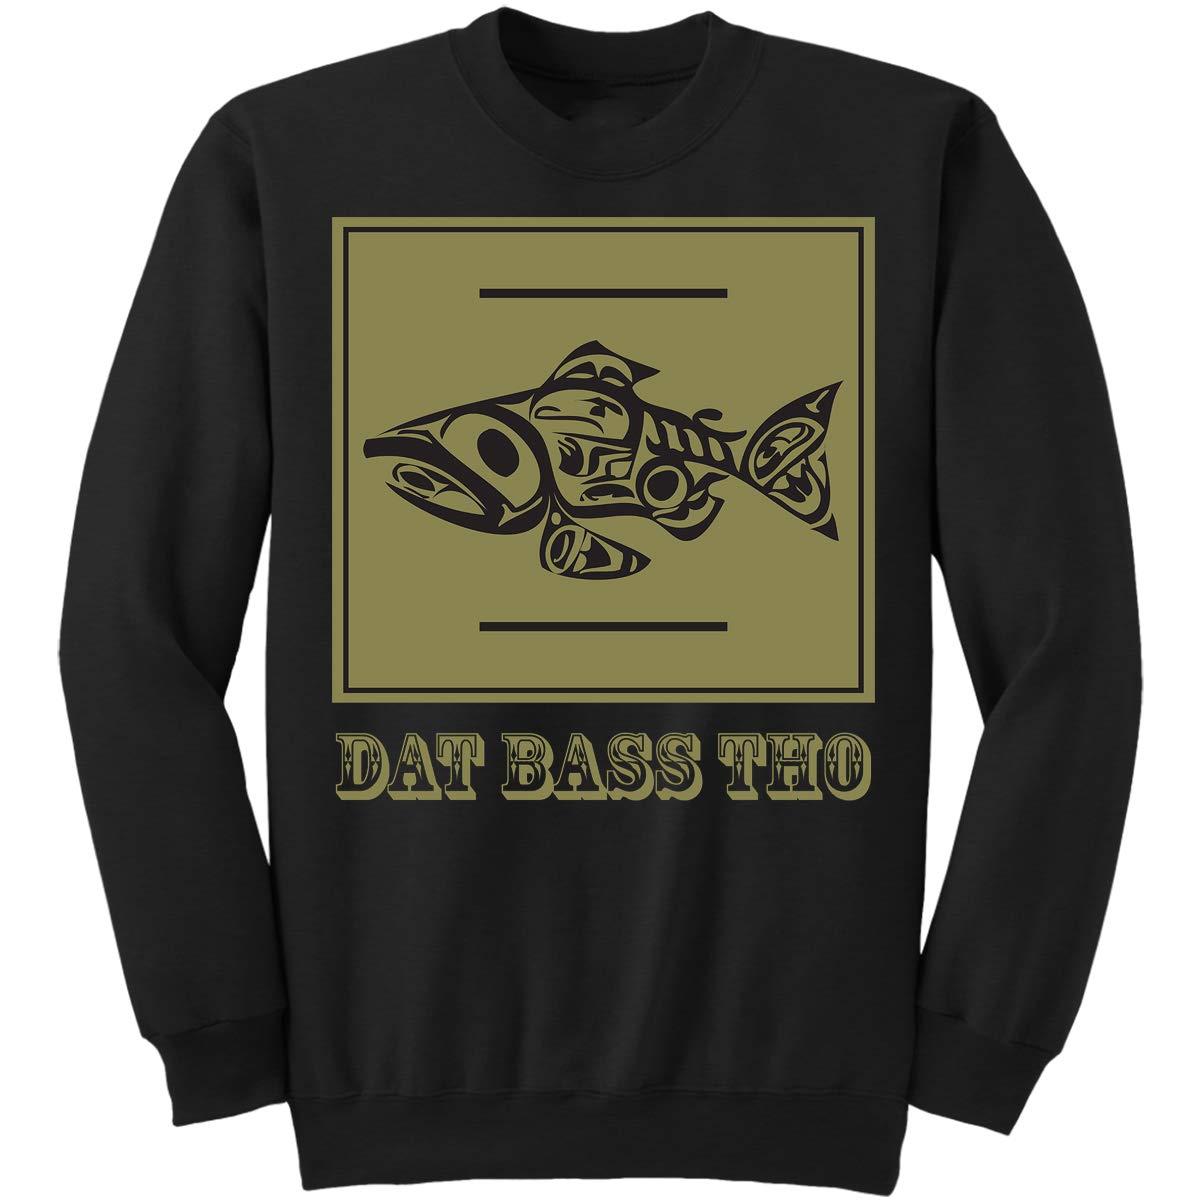 DoozyGifts99 Funny Fly Fishing Sports Trolling-Gift Sweatshirt